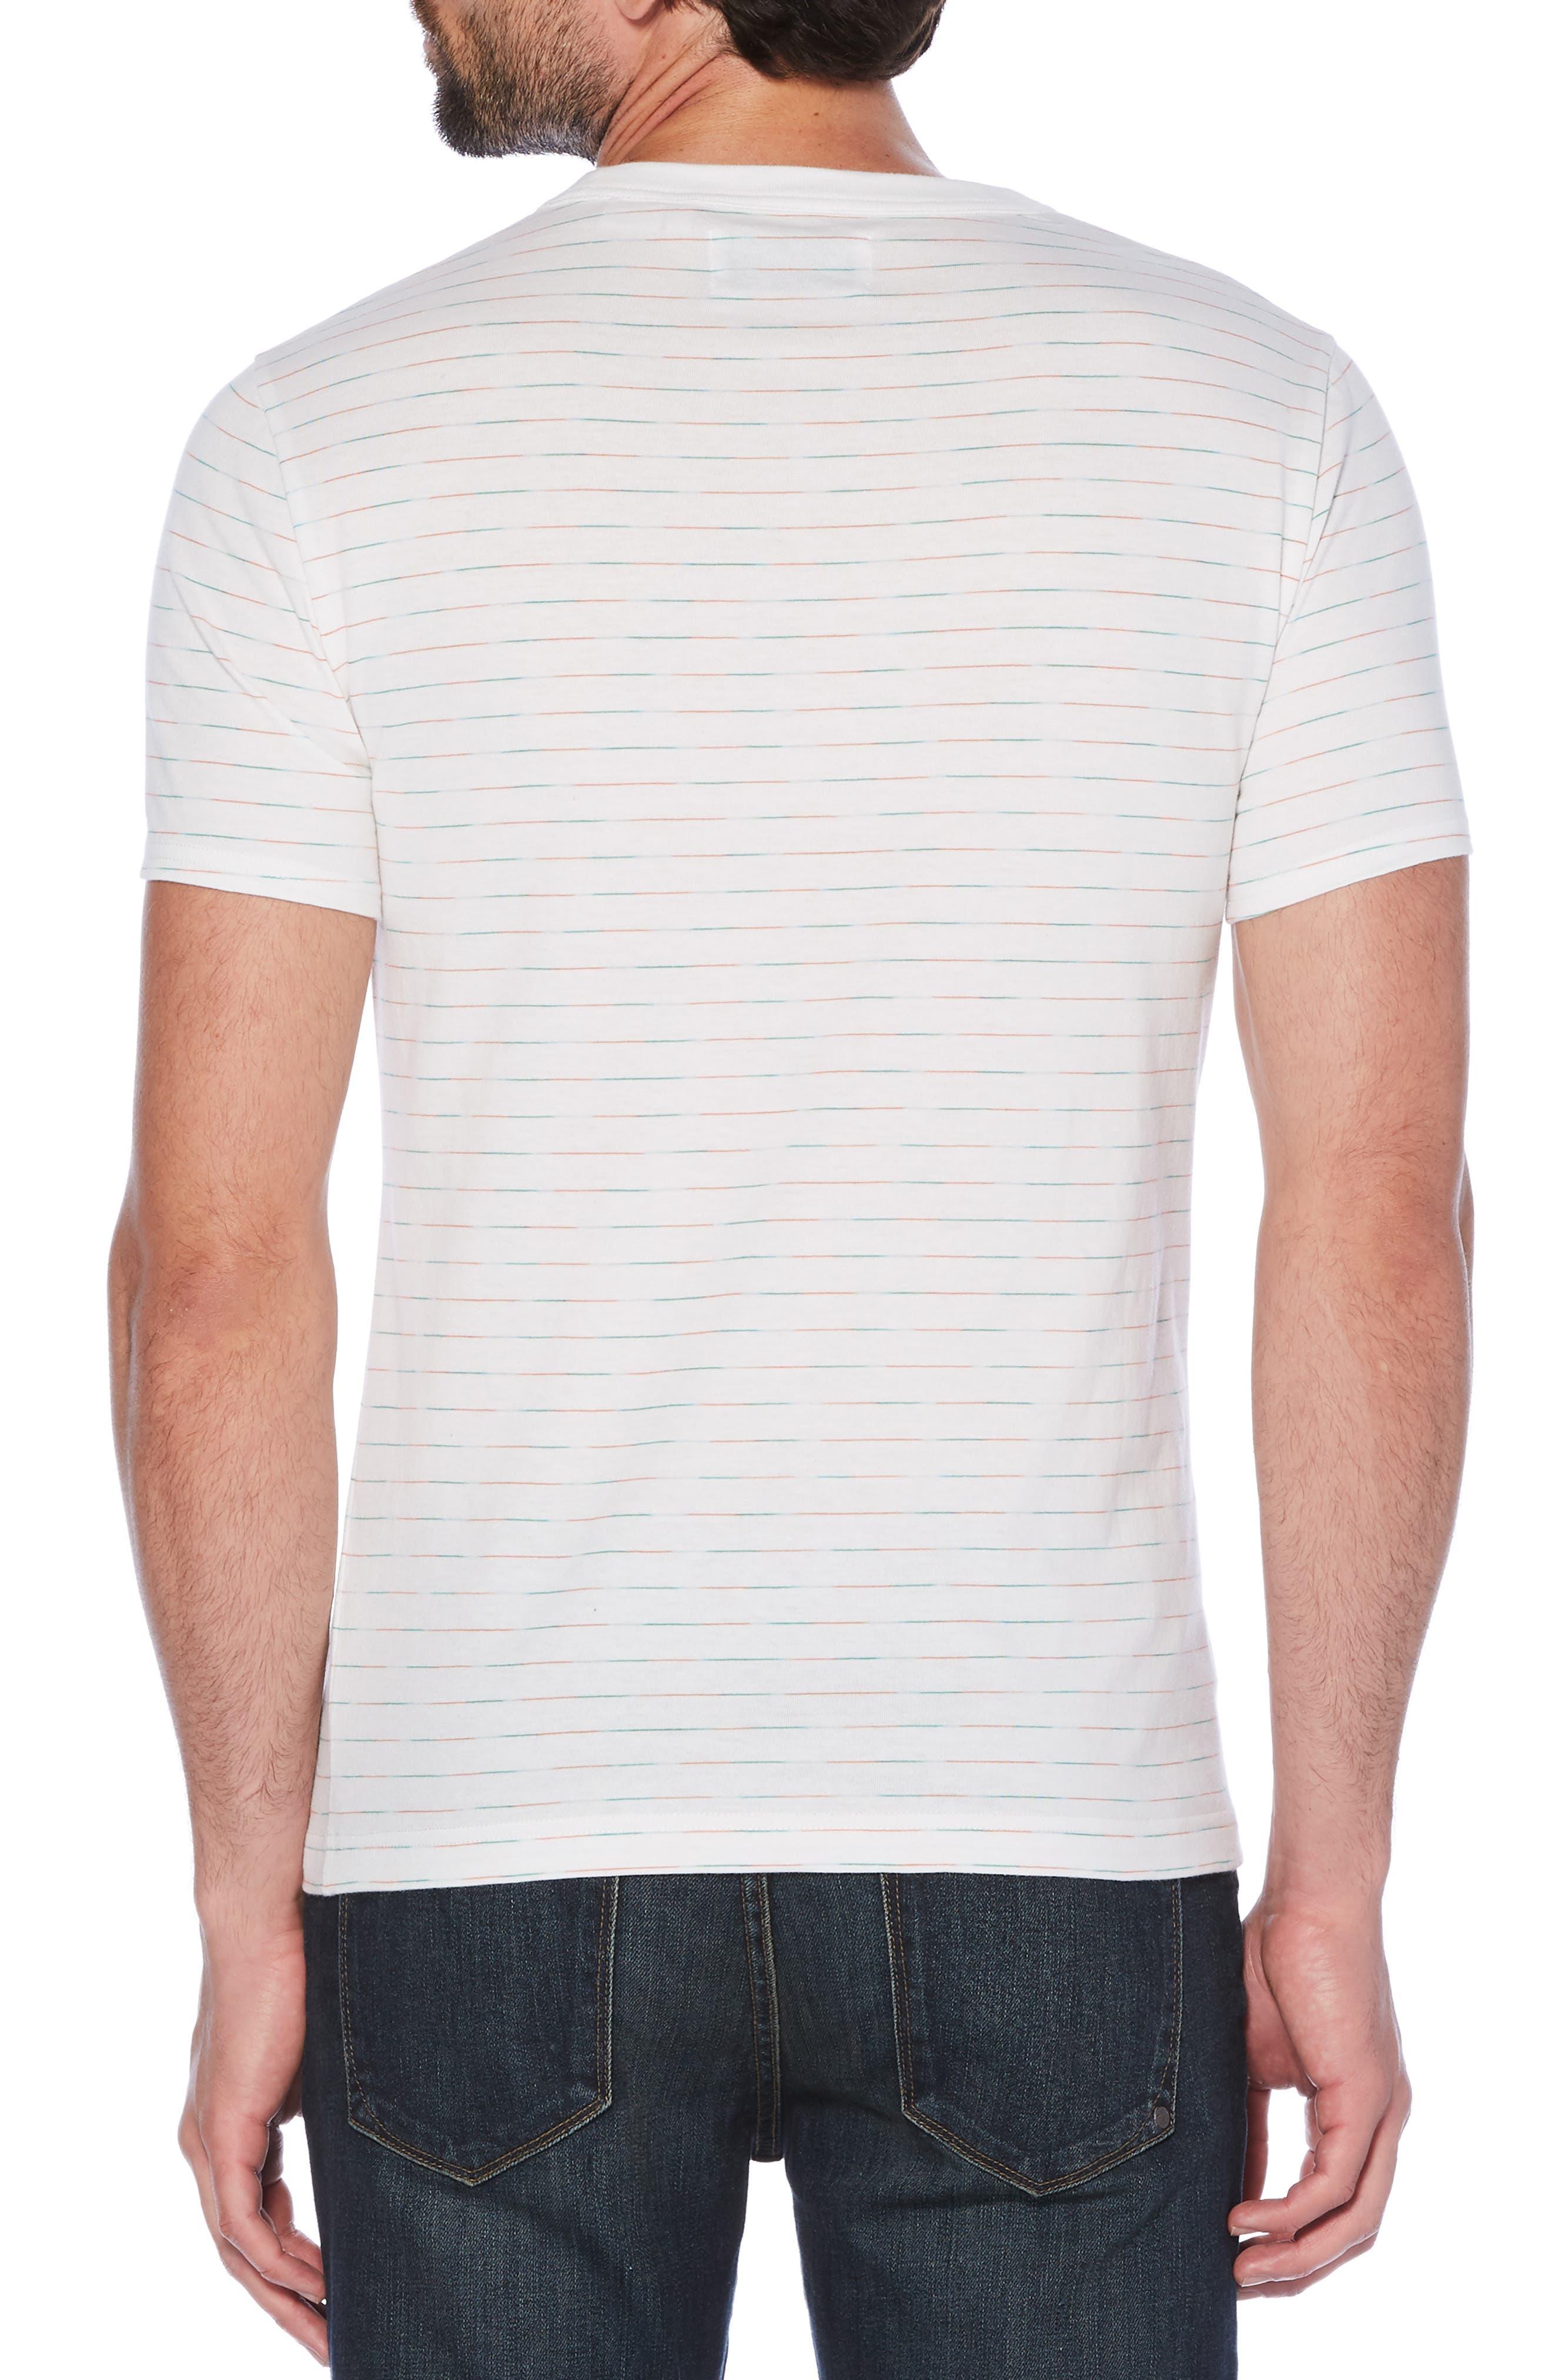 Space Dye Stripe T-Shirt,                             Alternate thumbnail 2, color,                             BRIGHT WHITE